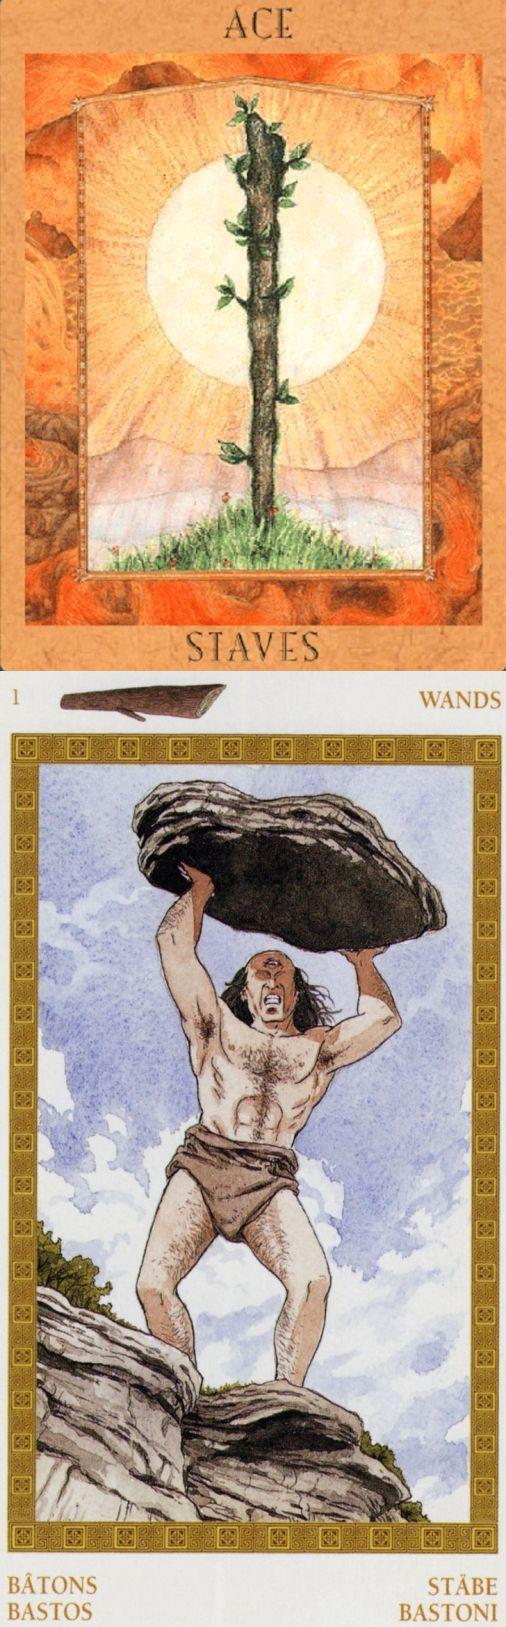 Ace of Wands: creation and boredom (reverse). Goddess New Tarot deck and Olympus Tarot deck: tarotmucha, free daily tarot reading vs tarotmini. Best 2017 psychic readings and paganism men. #ilovemywitchyways #wicca #thesun #lovers #iosapplication